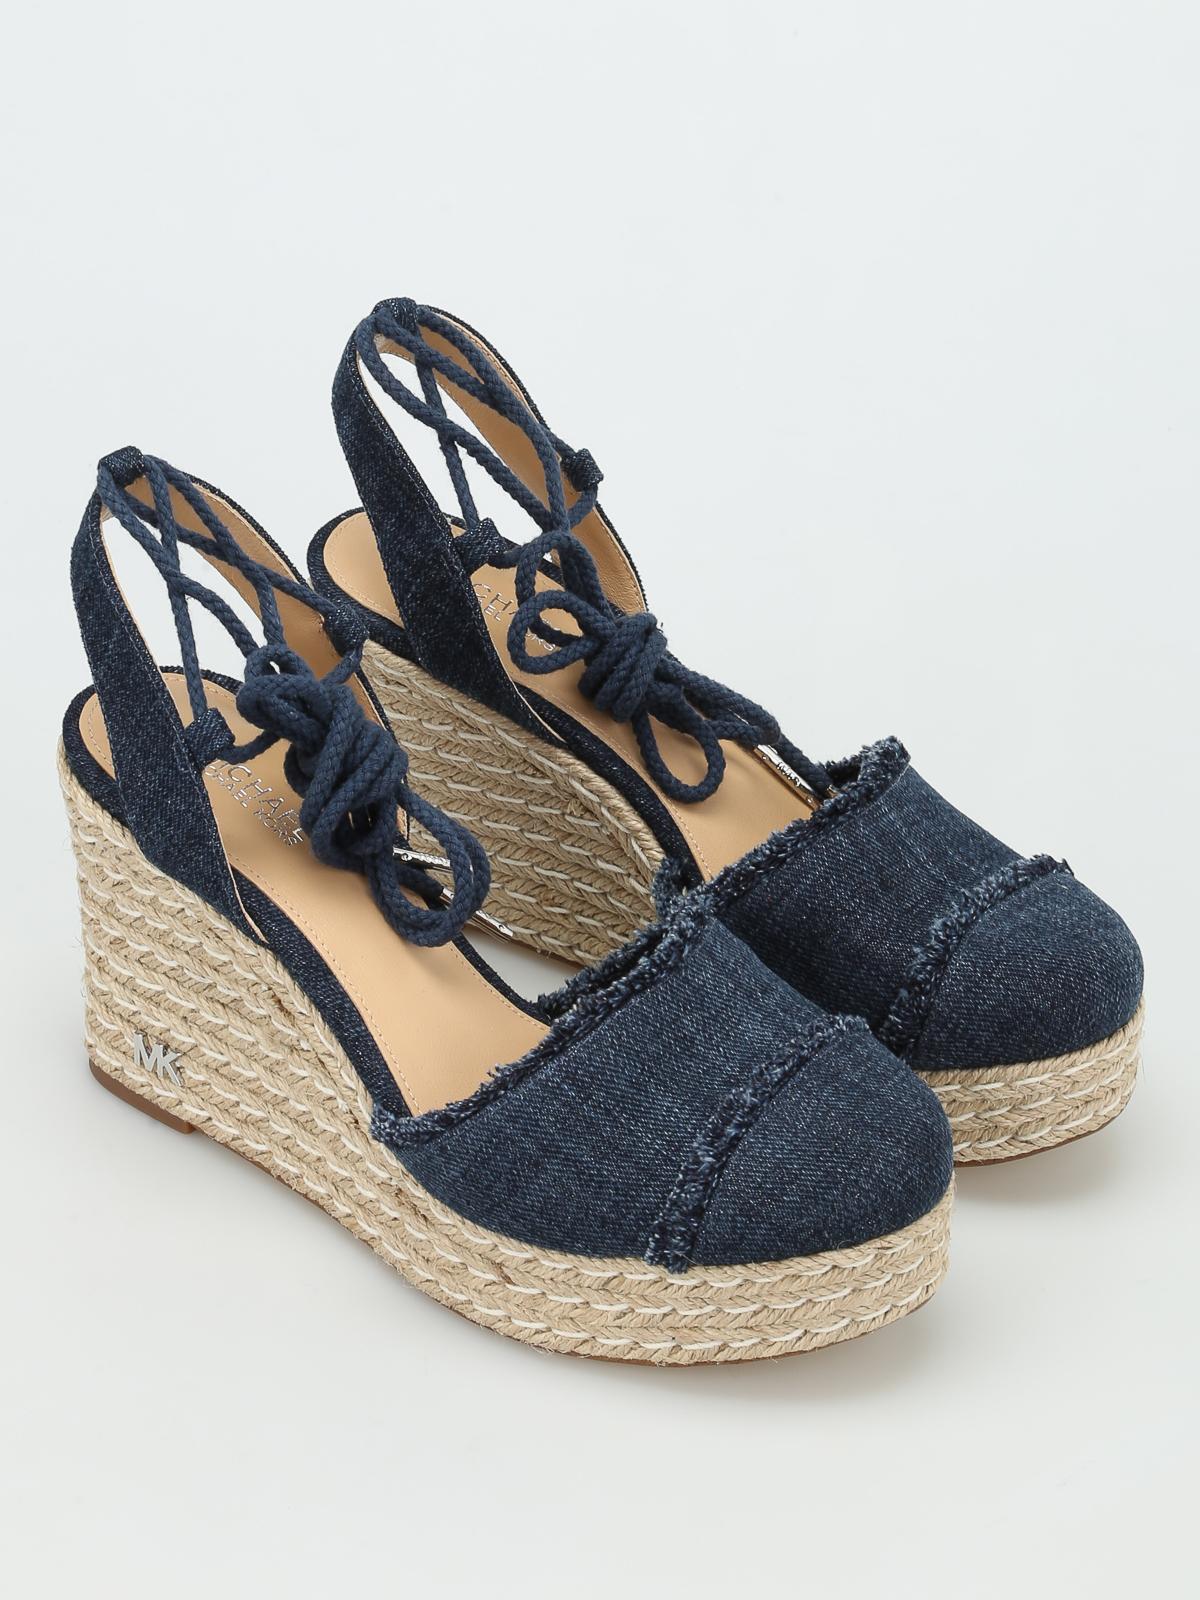 Michael Kors - Sandals for woman - Online Outlet € 93